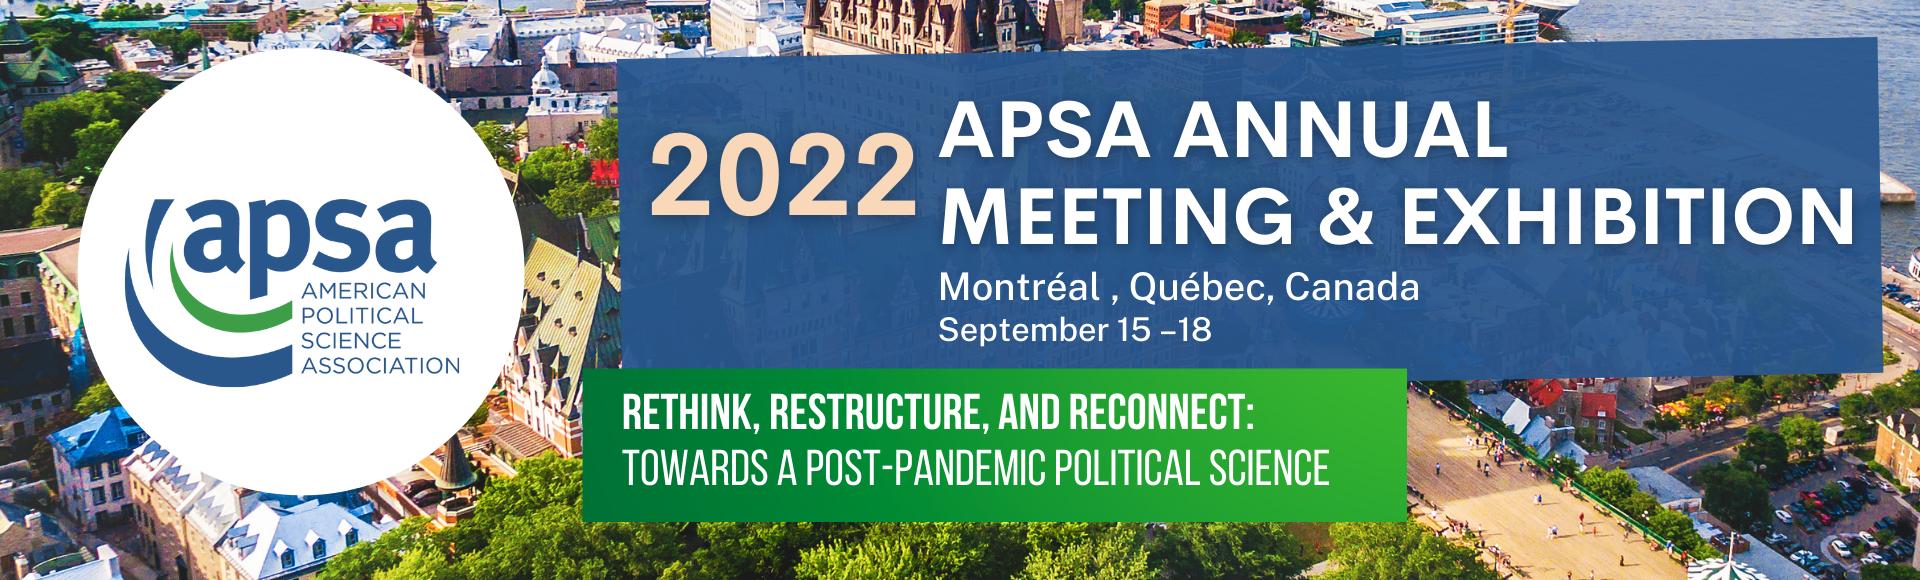 2022 APSA Annual Meeting & Exhibition